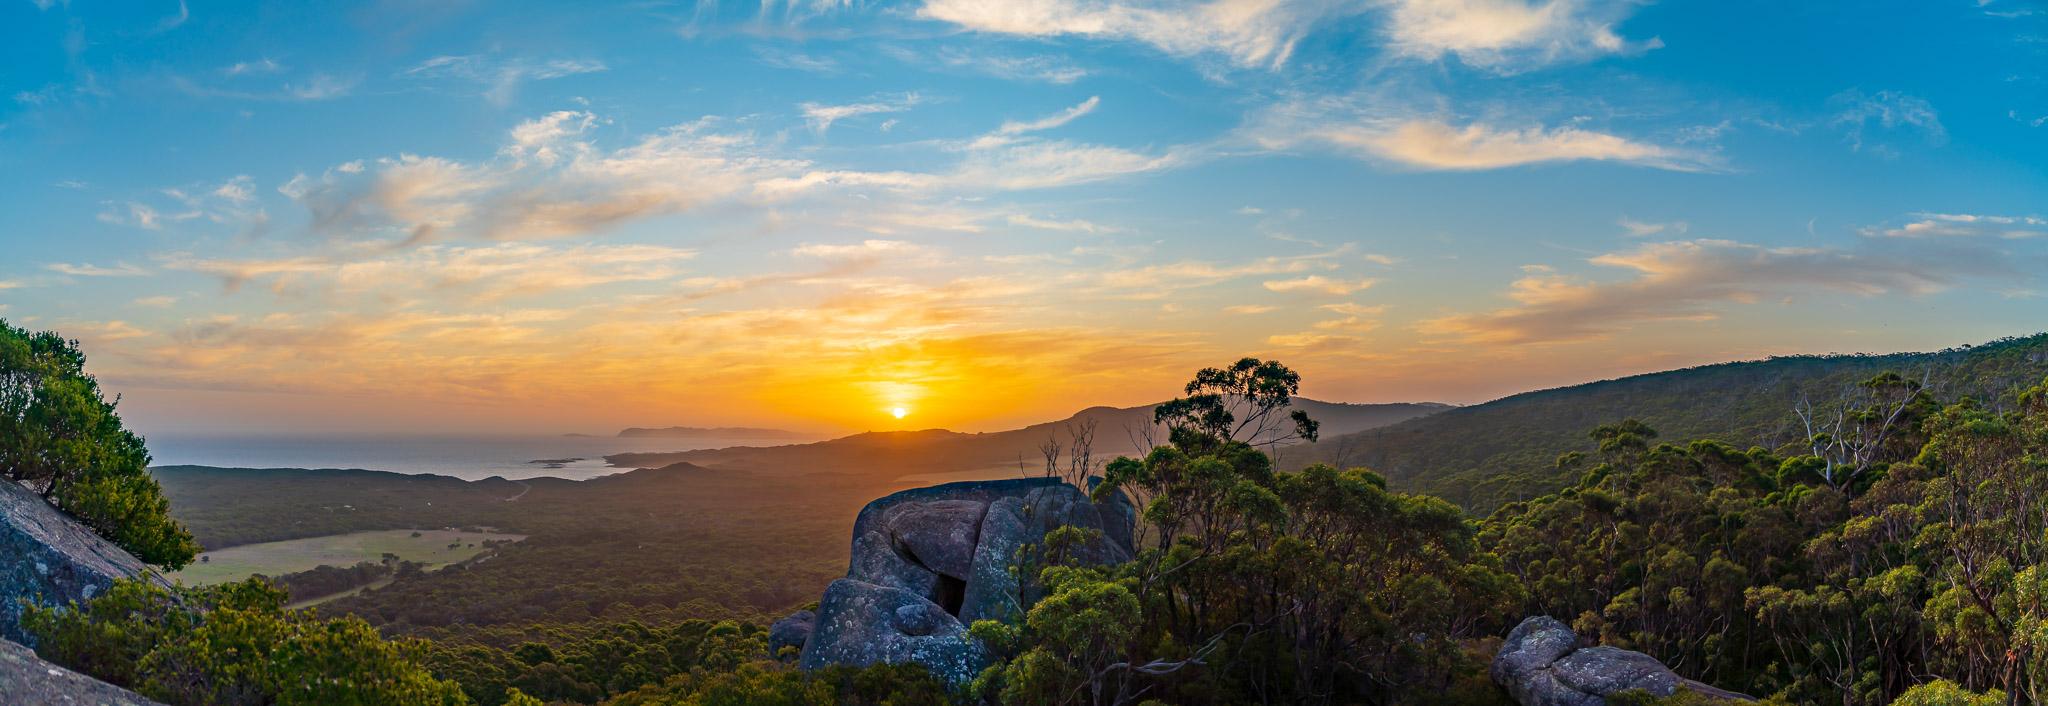 Monkey Rock Sunset